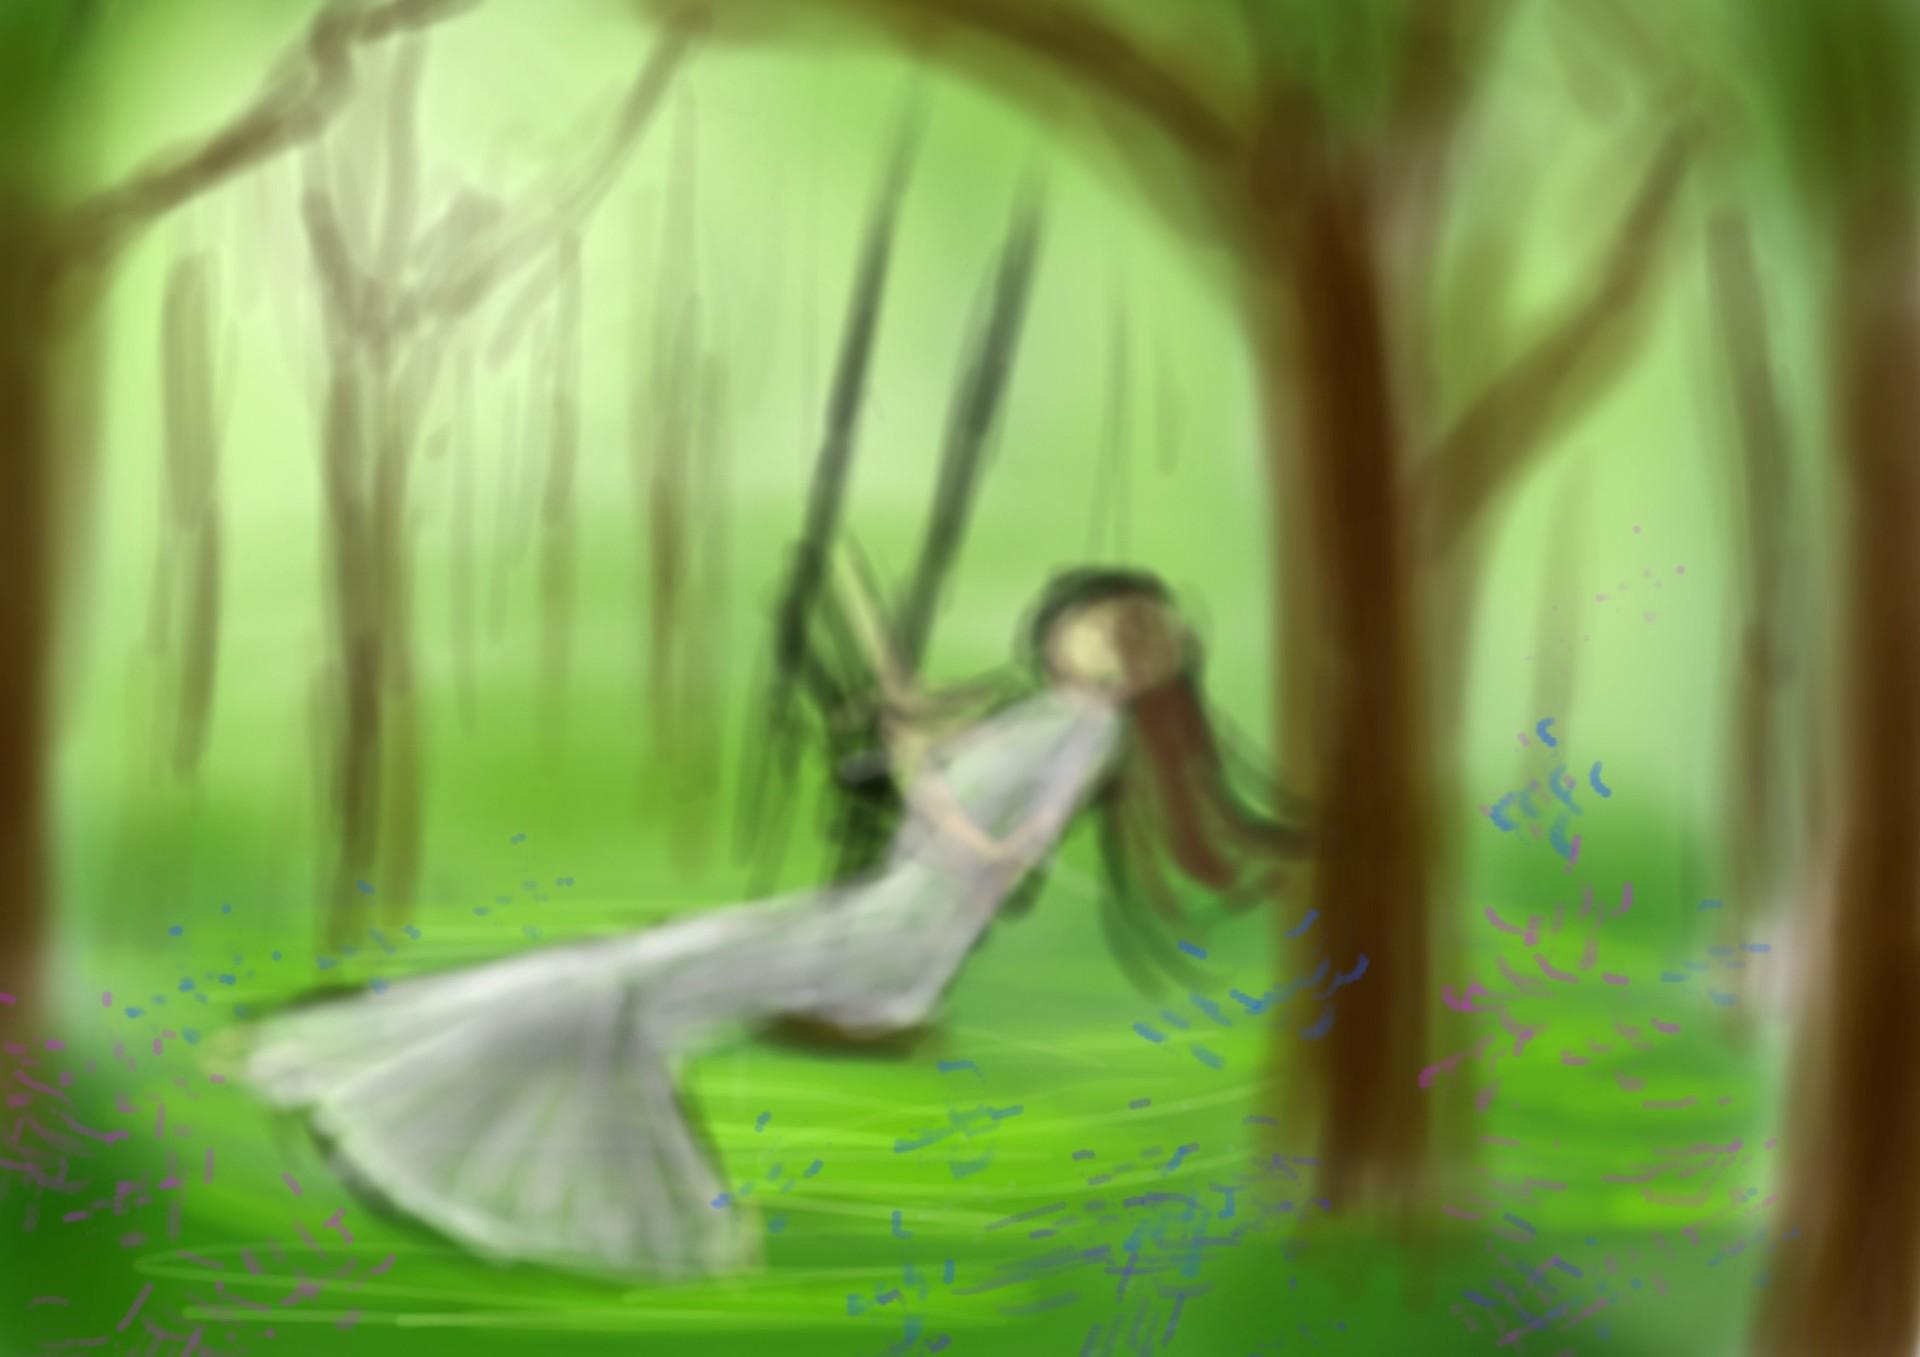 Akai shoku spring sketch